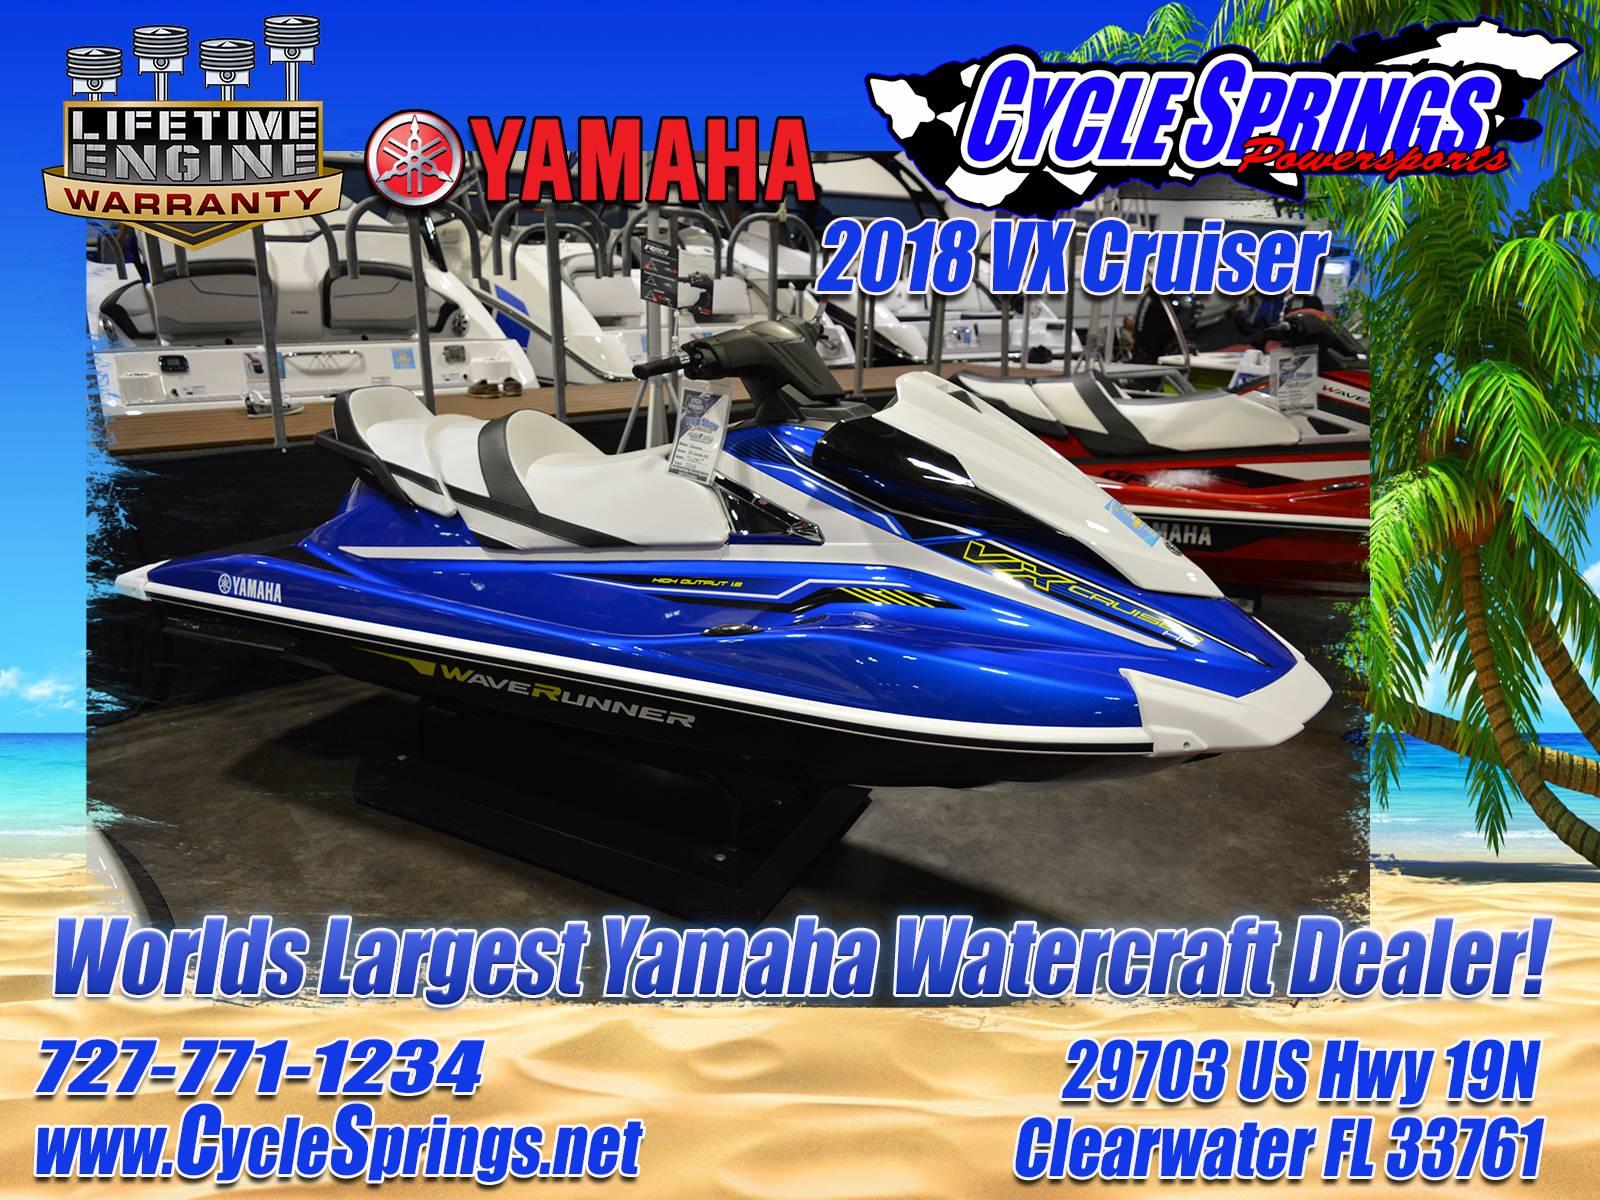 New 2018 Yamaha VX Cruiser Watercraft in Clearwater FL